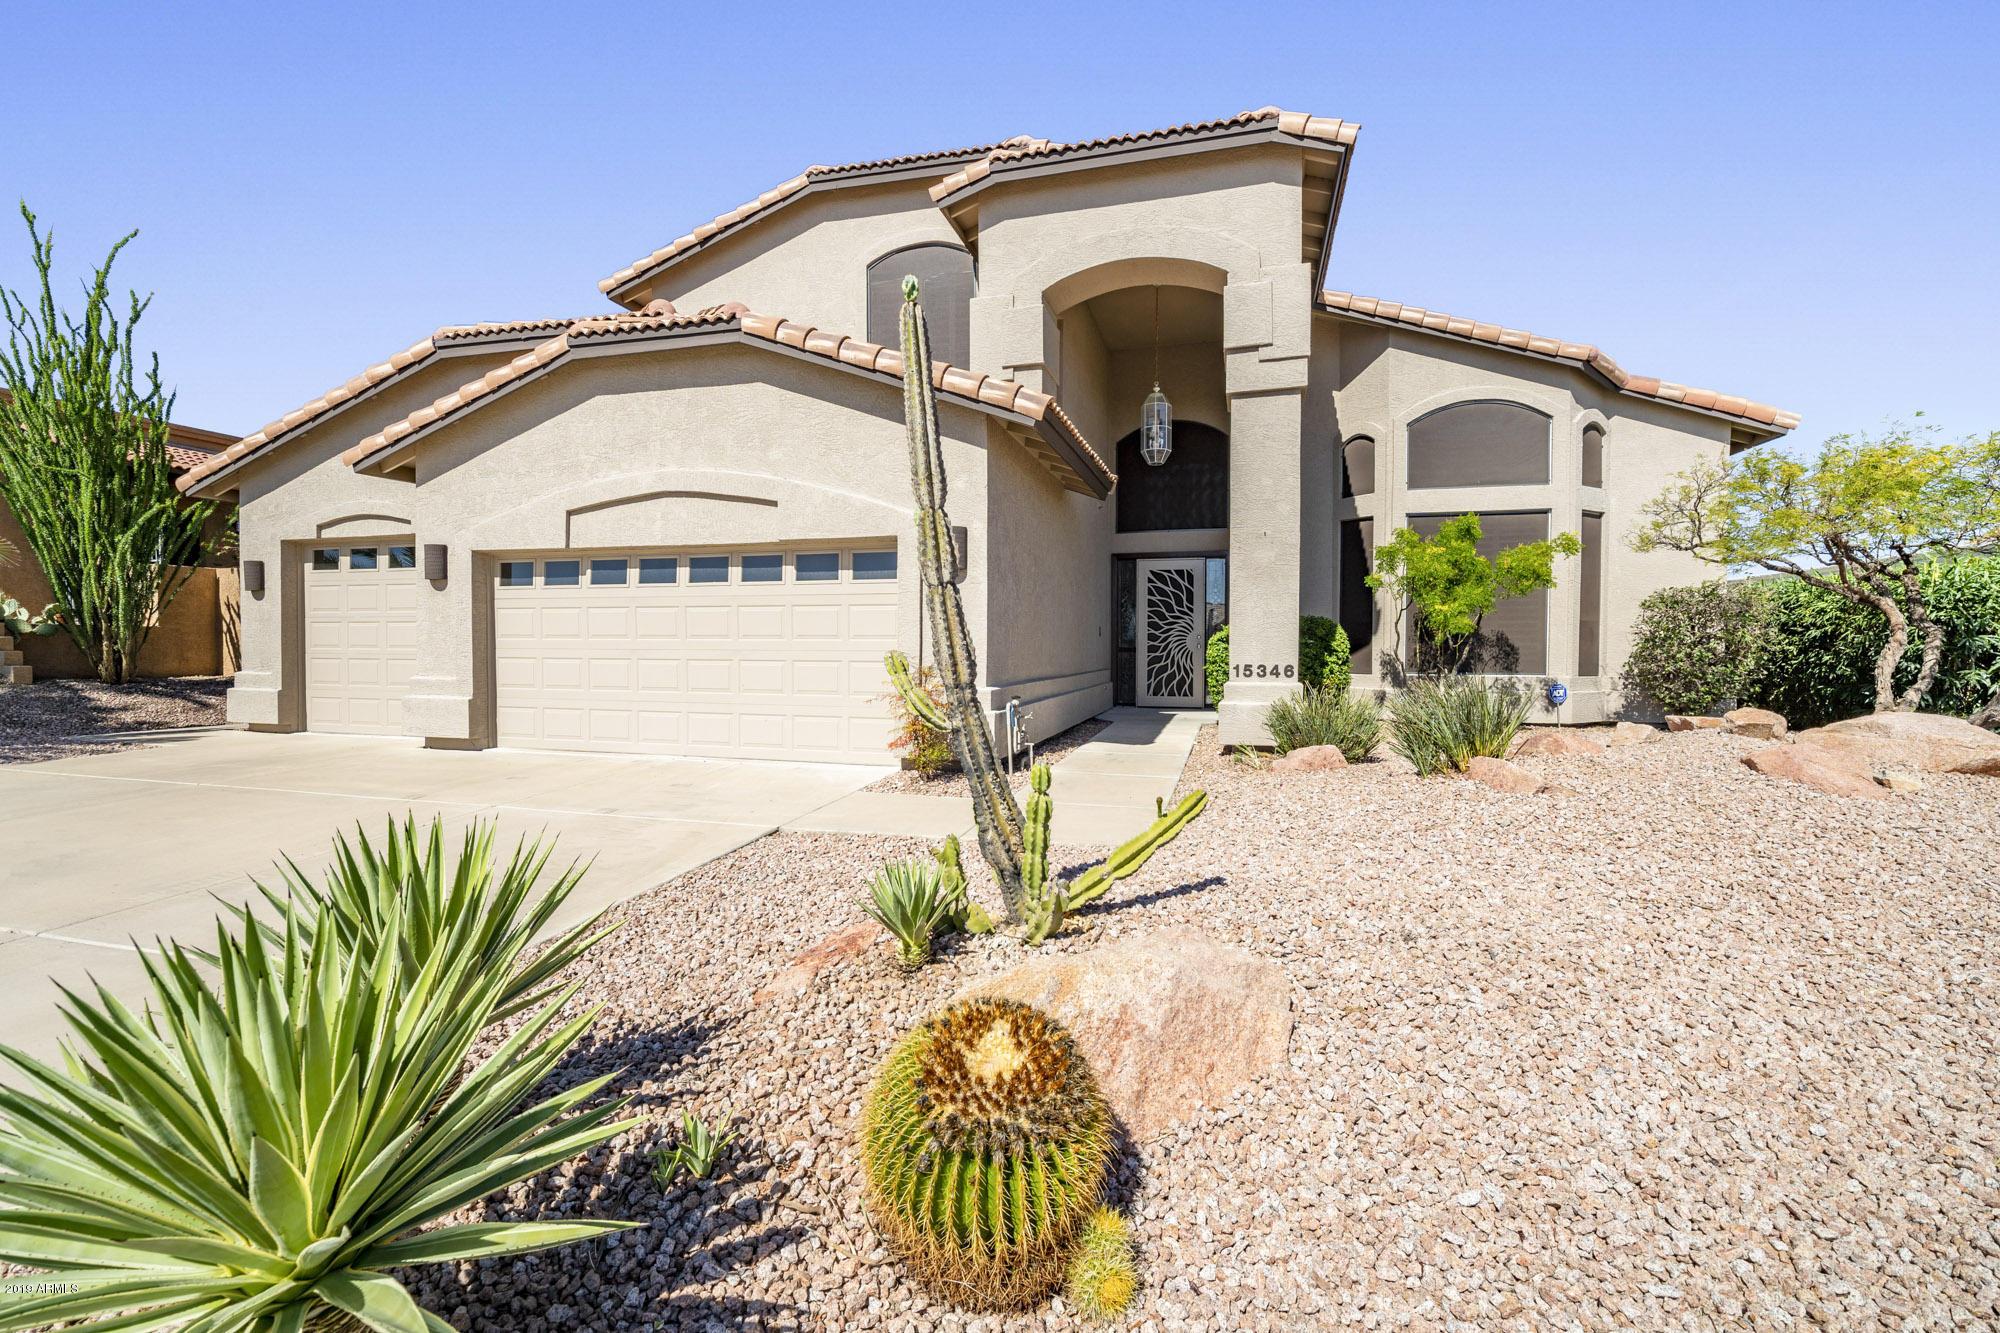 MLS 6080828 Fountain Hills Metro Area, Fountain Hills, AZ 85268 Fountain Hills Homes for Rent